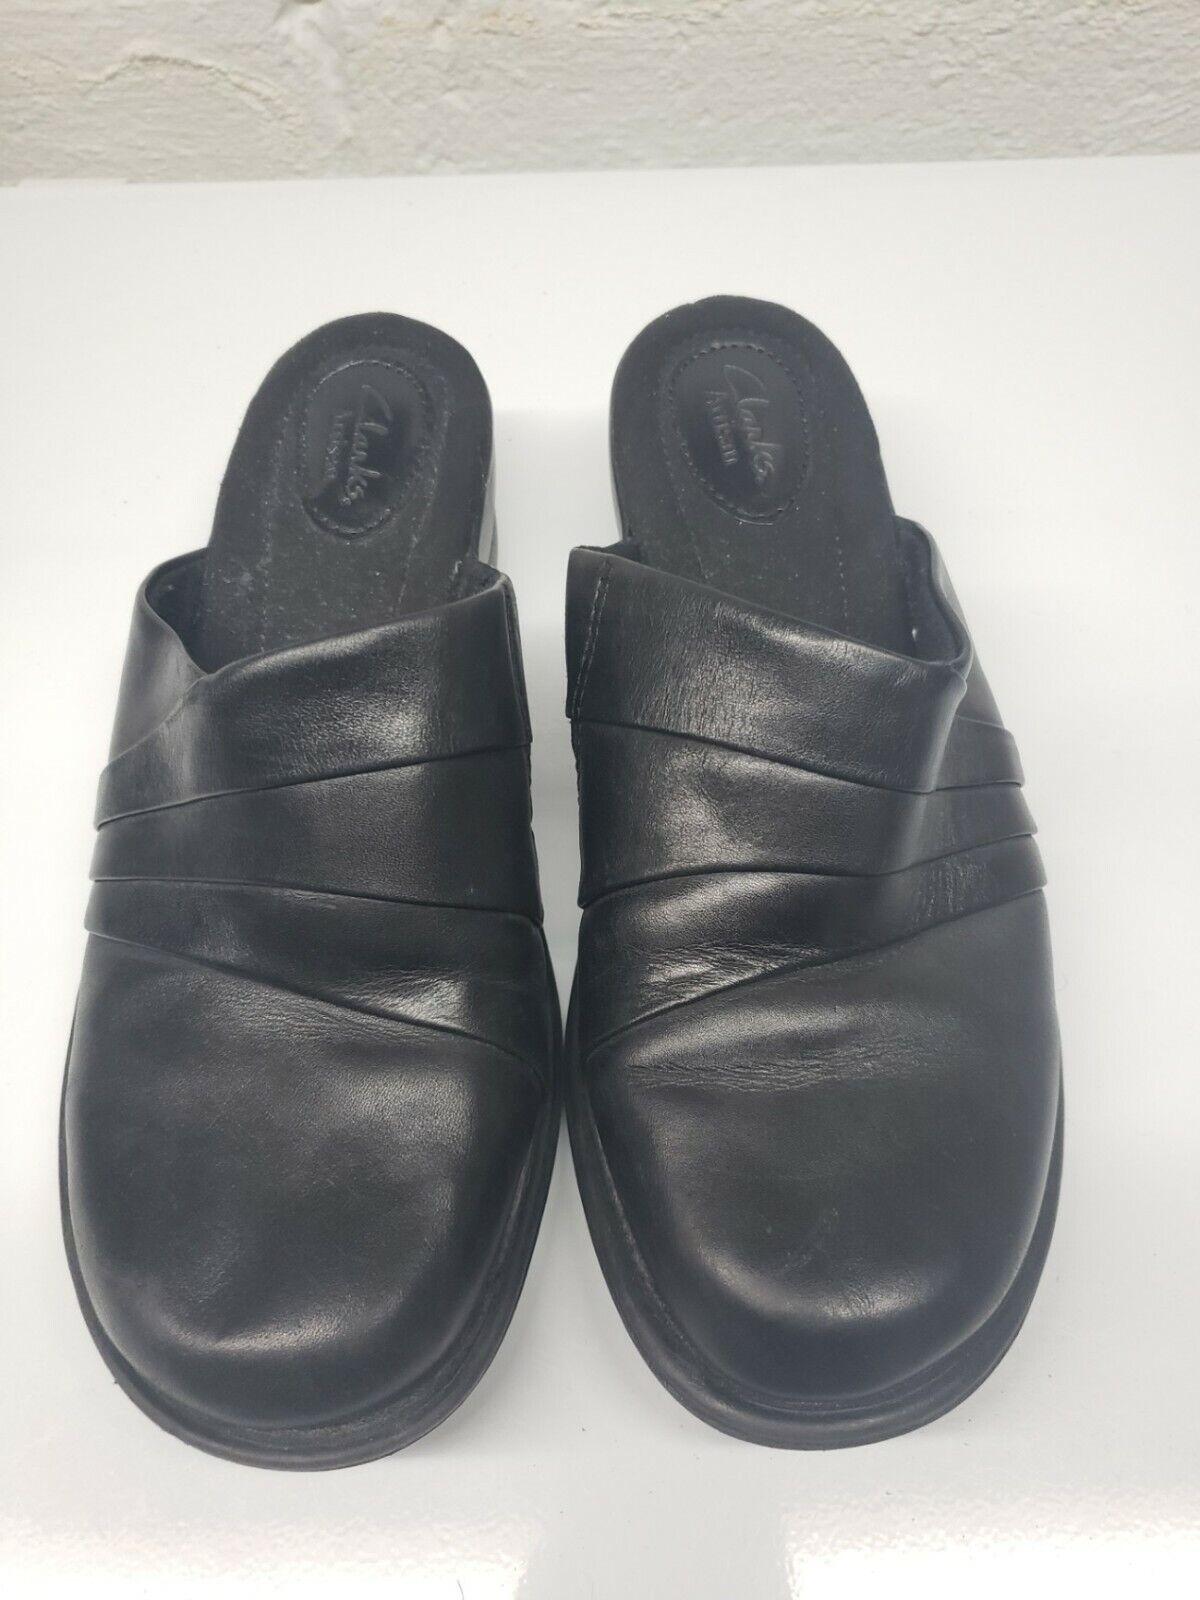 Clarks Artisan Womens Leather Slip On Comfort Black Clogs Size US 8 W